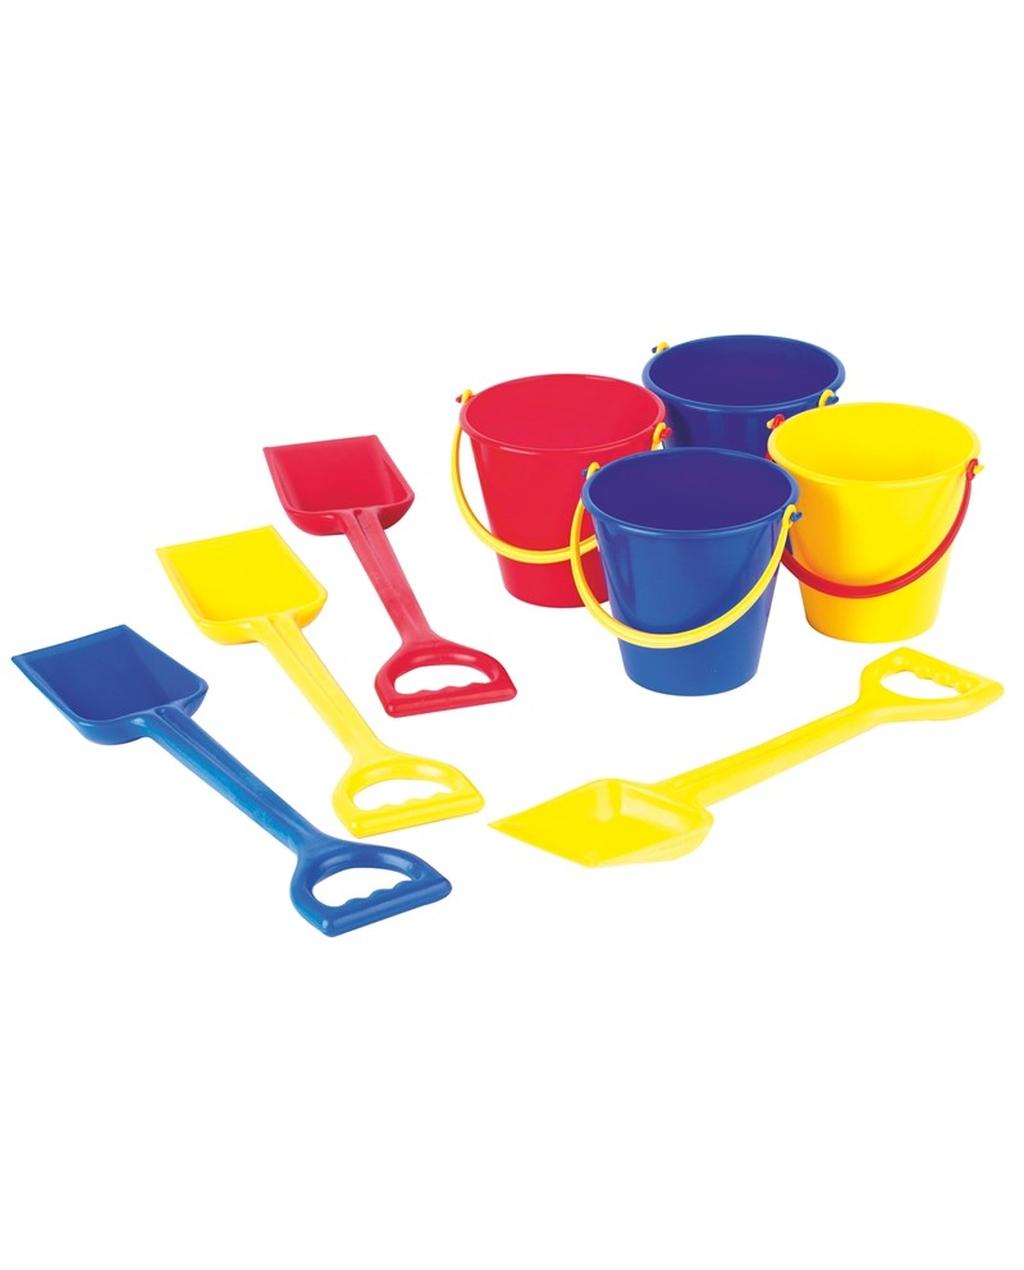 Buckets and Spades Set